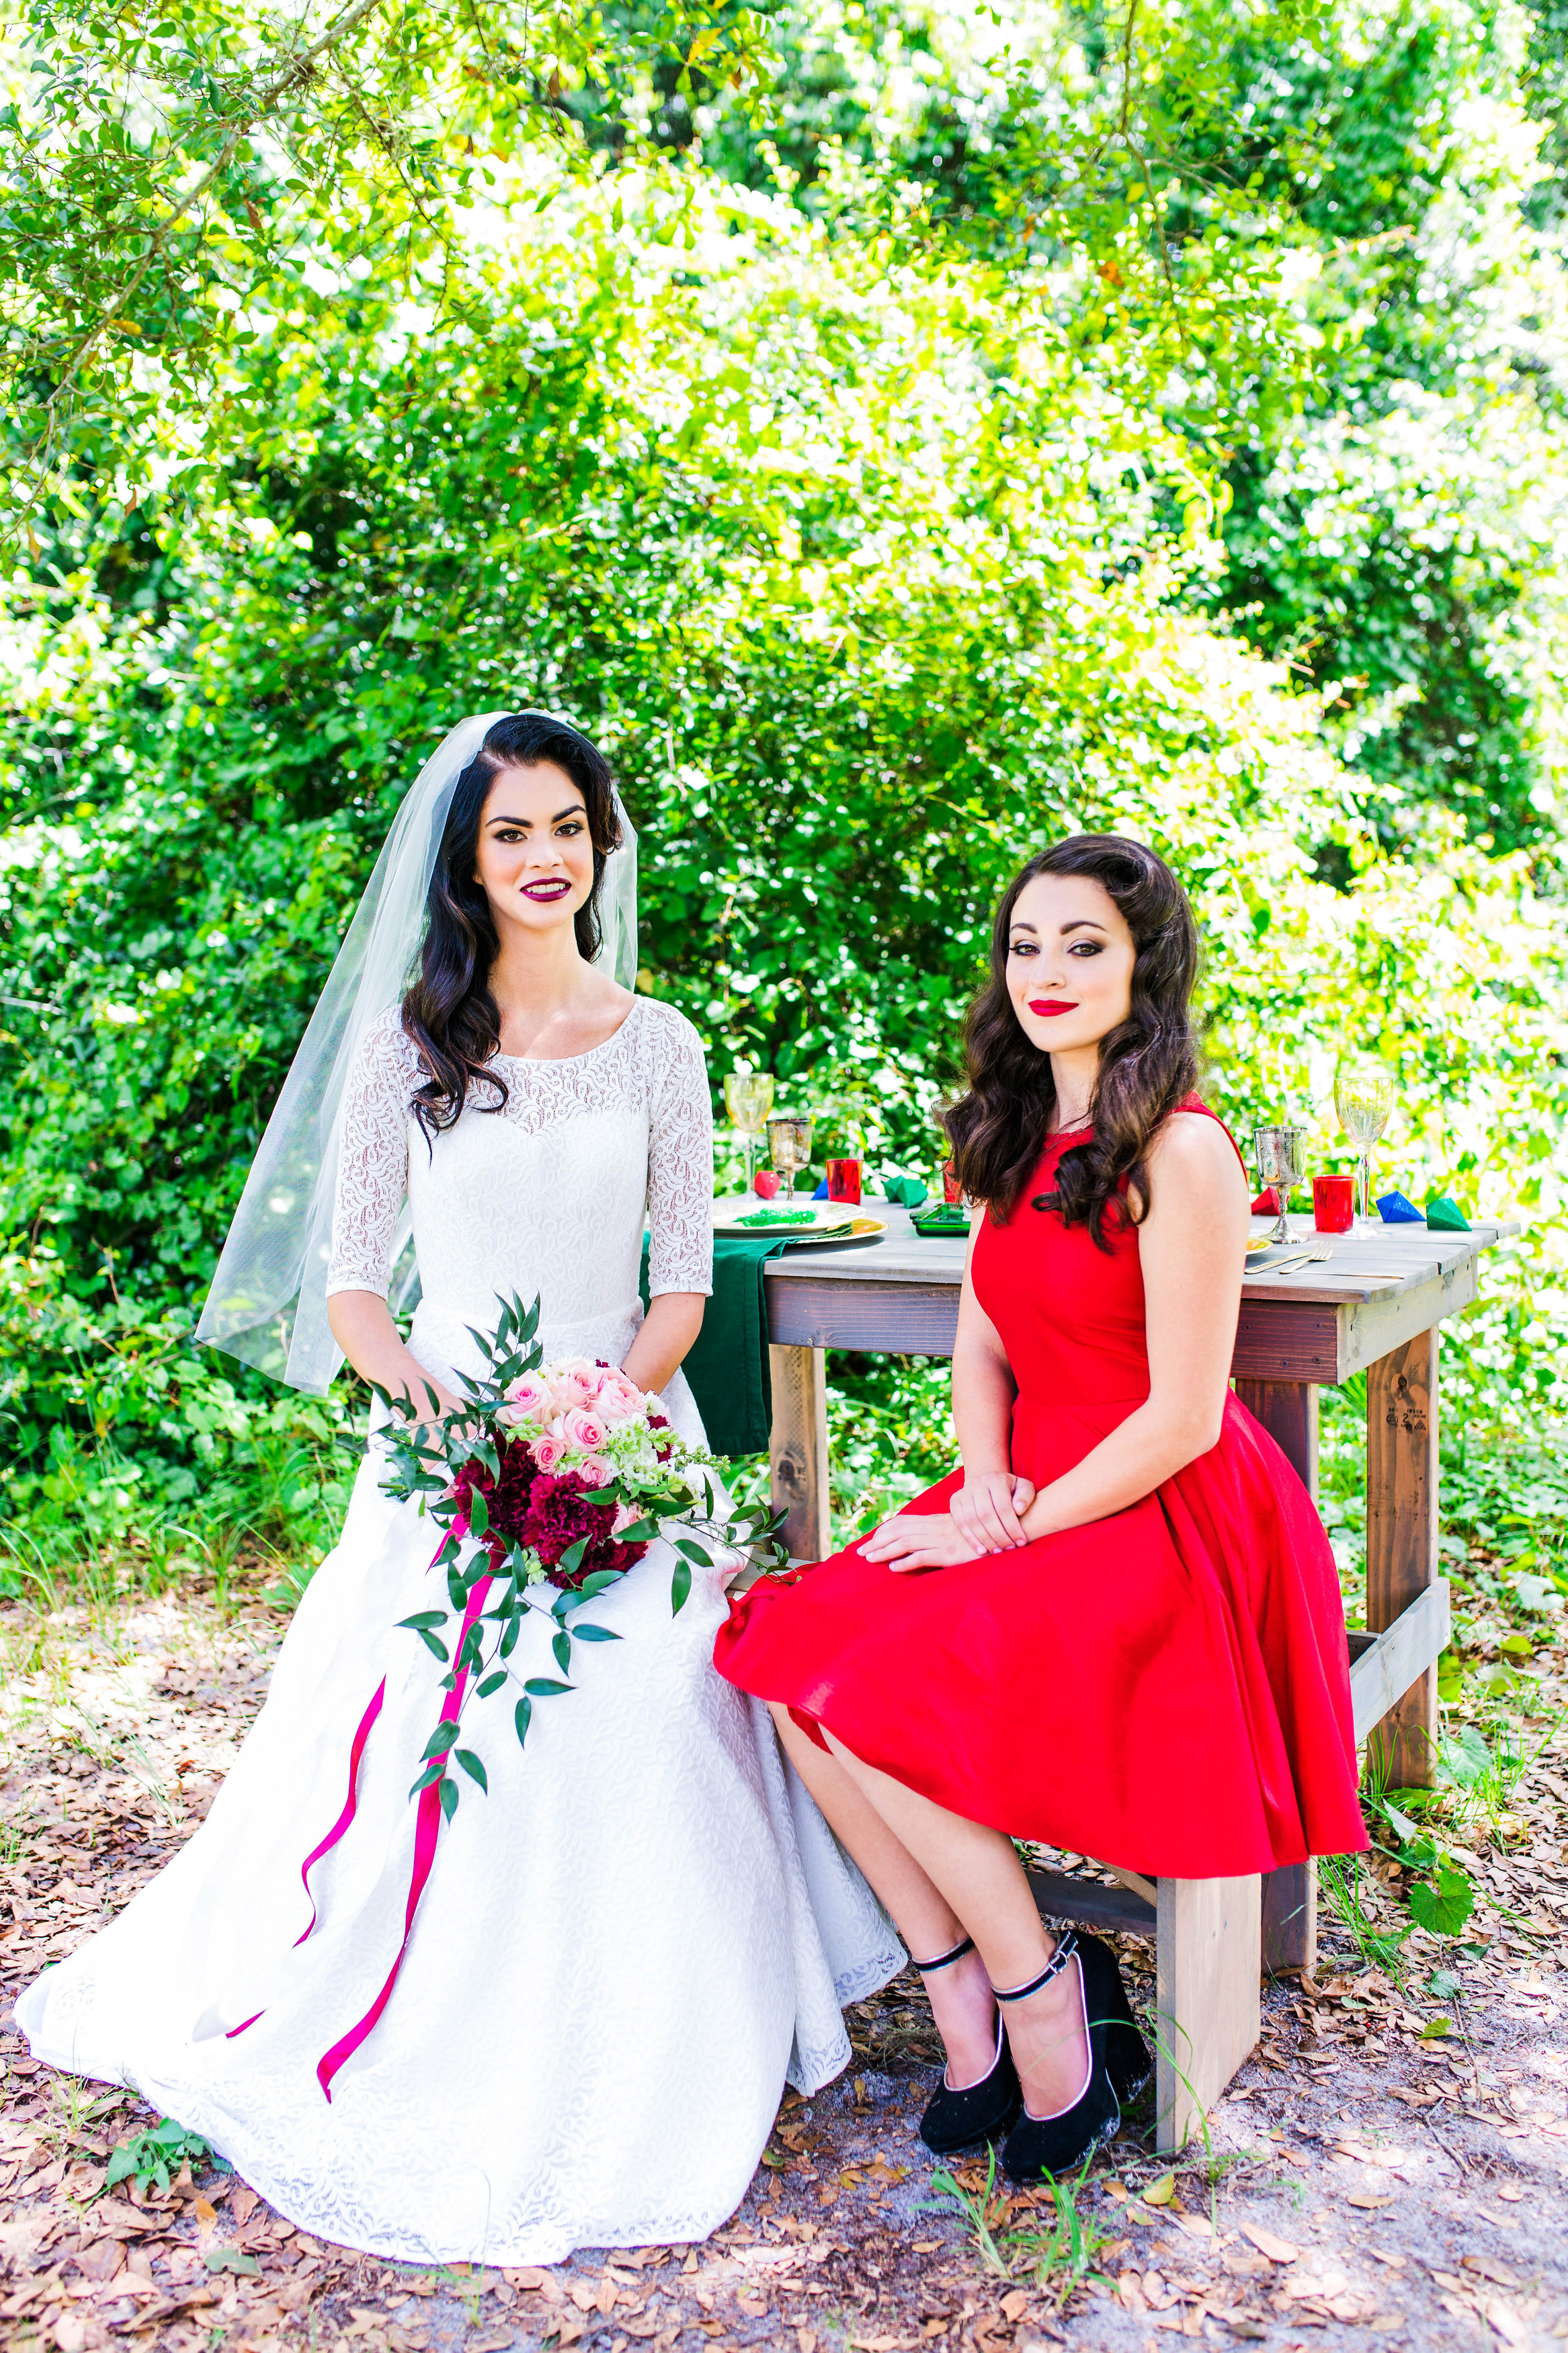 Macy and Talia